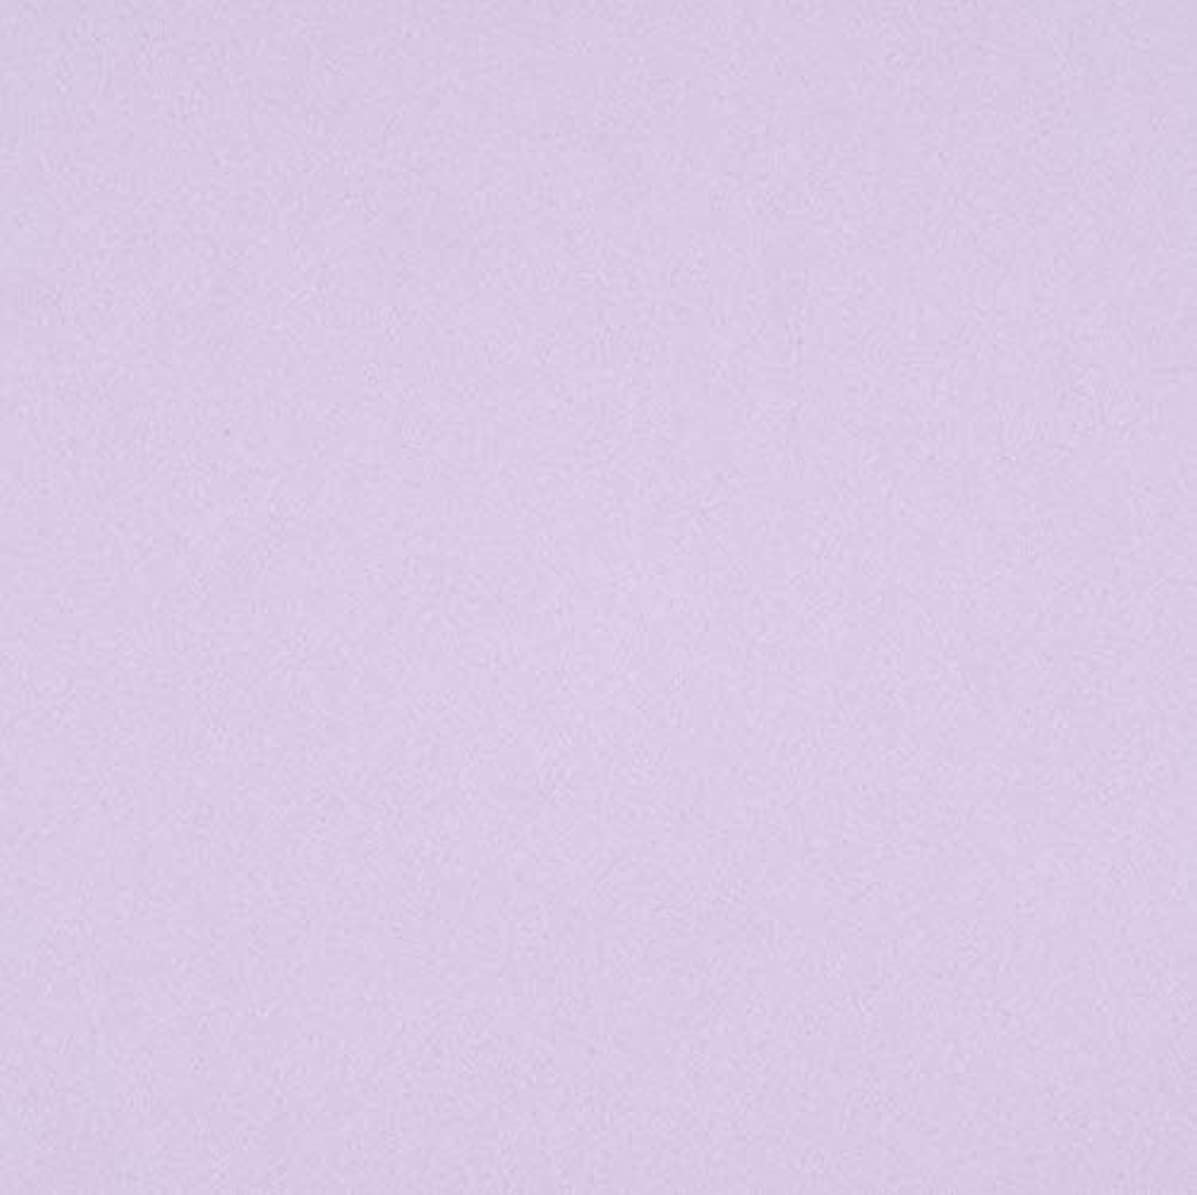 Darice 1040-65 Foamie Sheet Lavender 2Mm 9X12, Multicolor